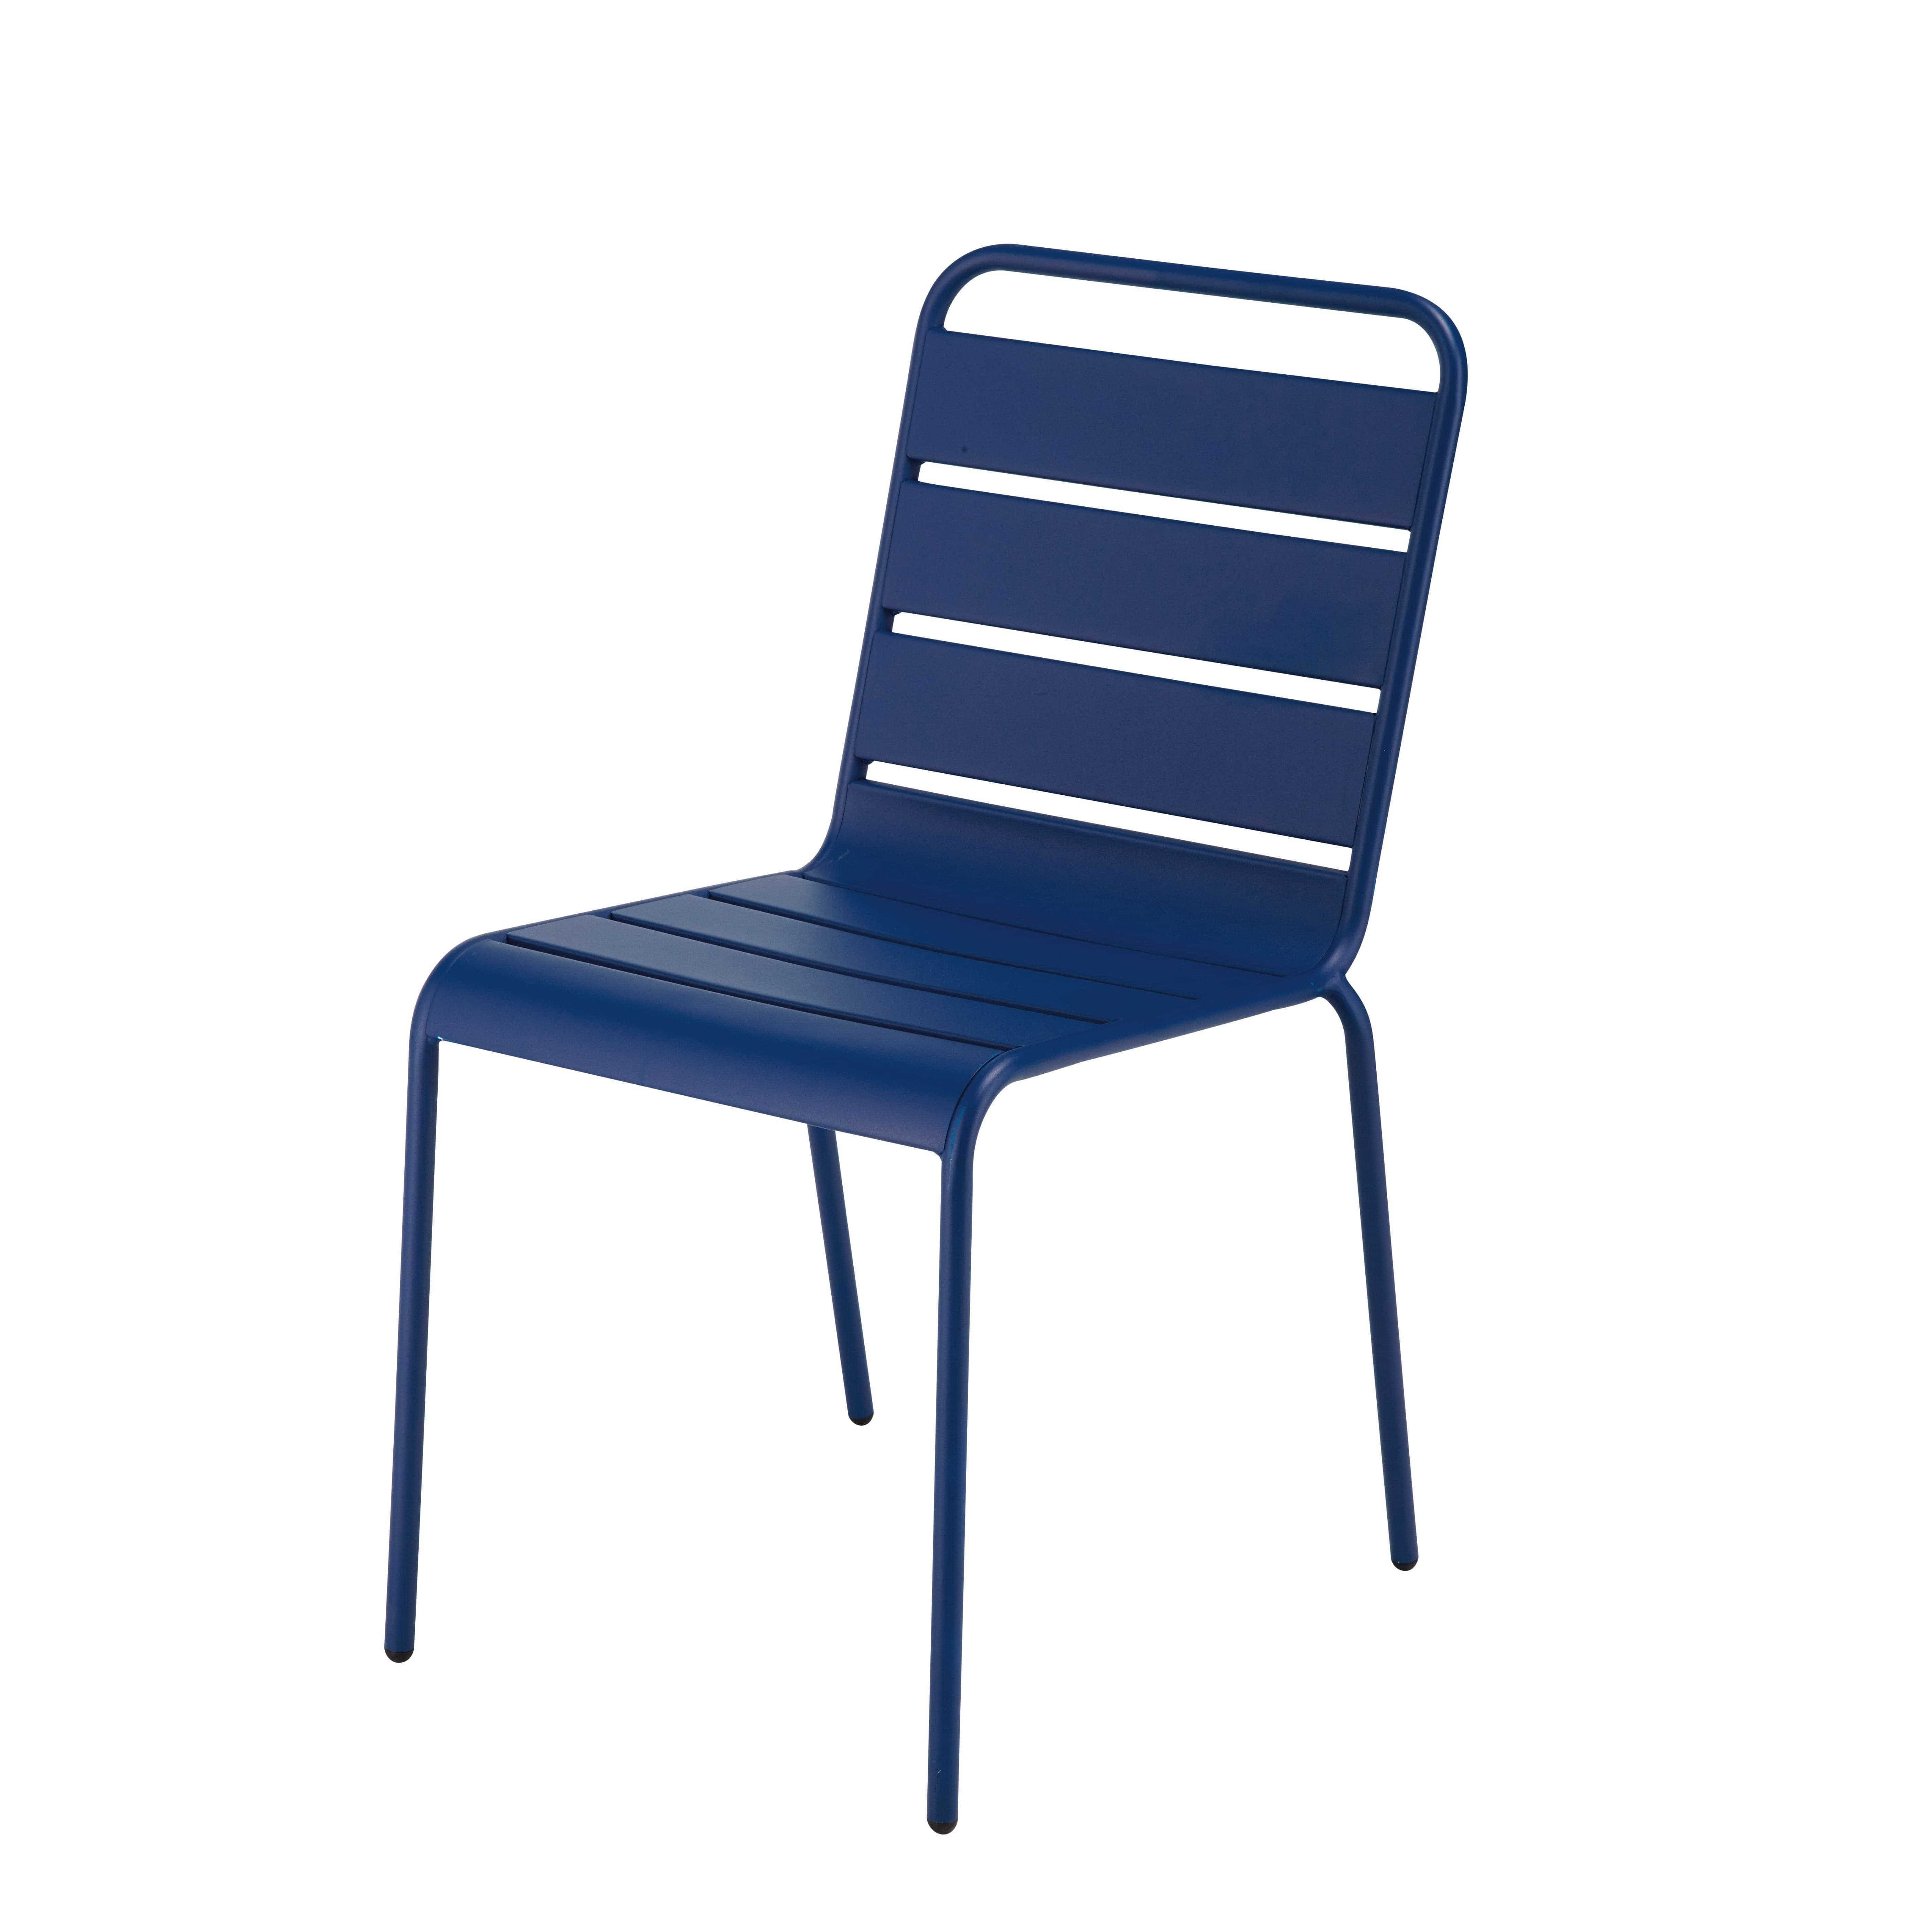 Stapelbarer Gartenstuhl aus marineblauem Metall Jetzt bestellen ...